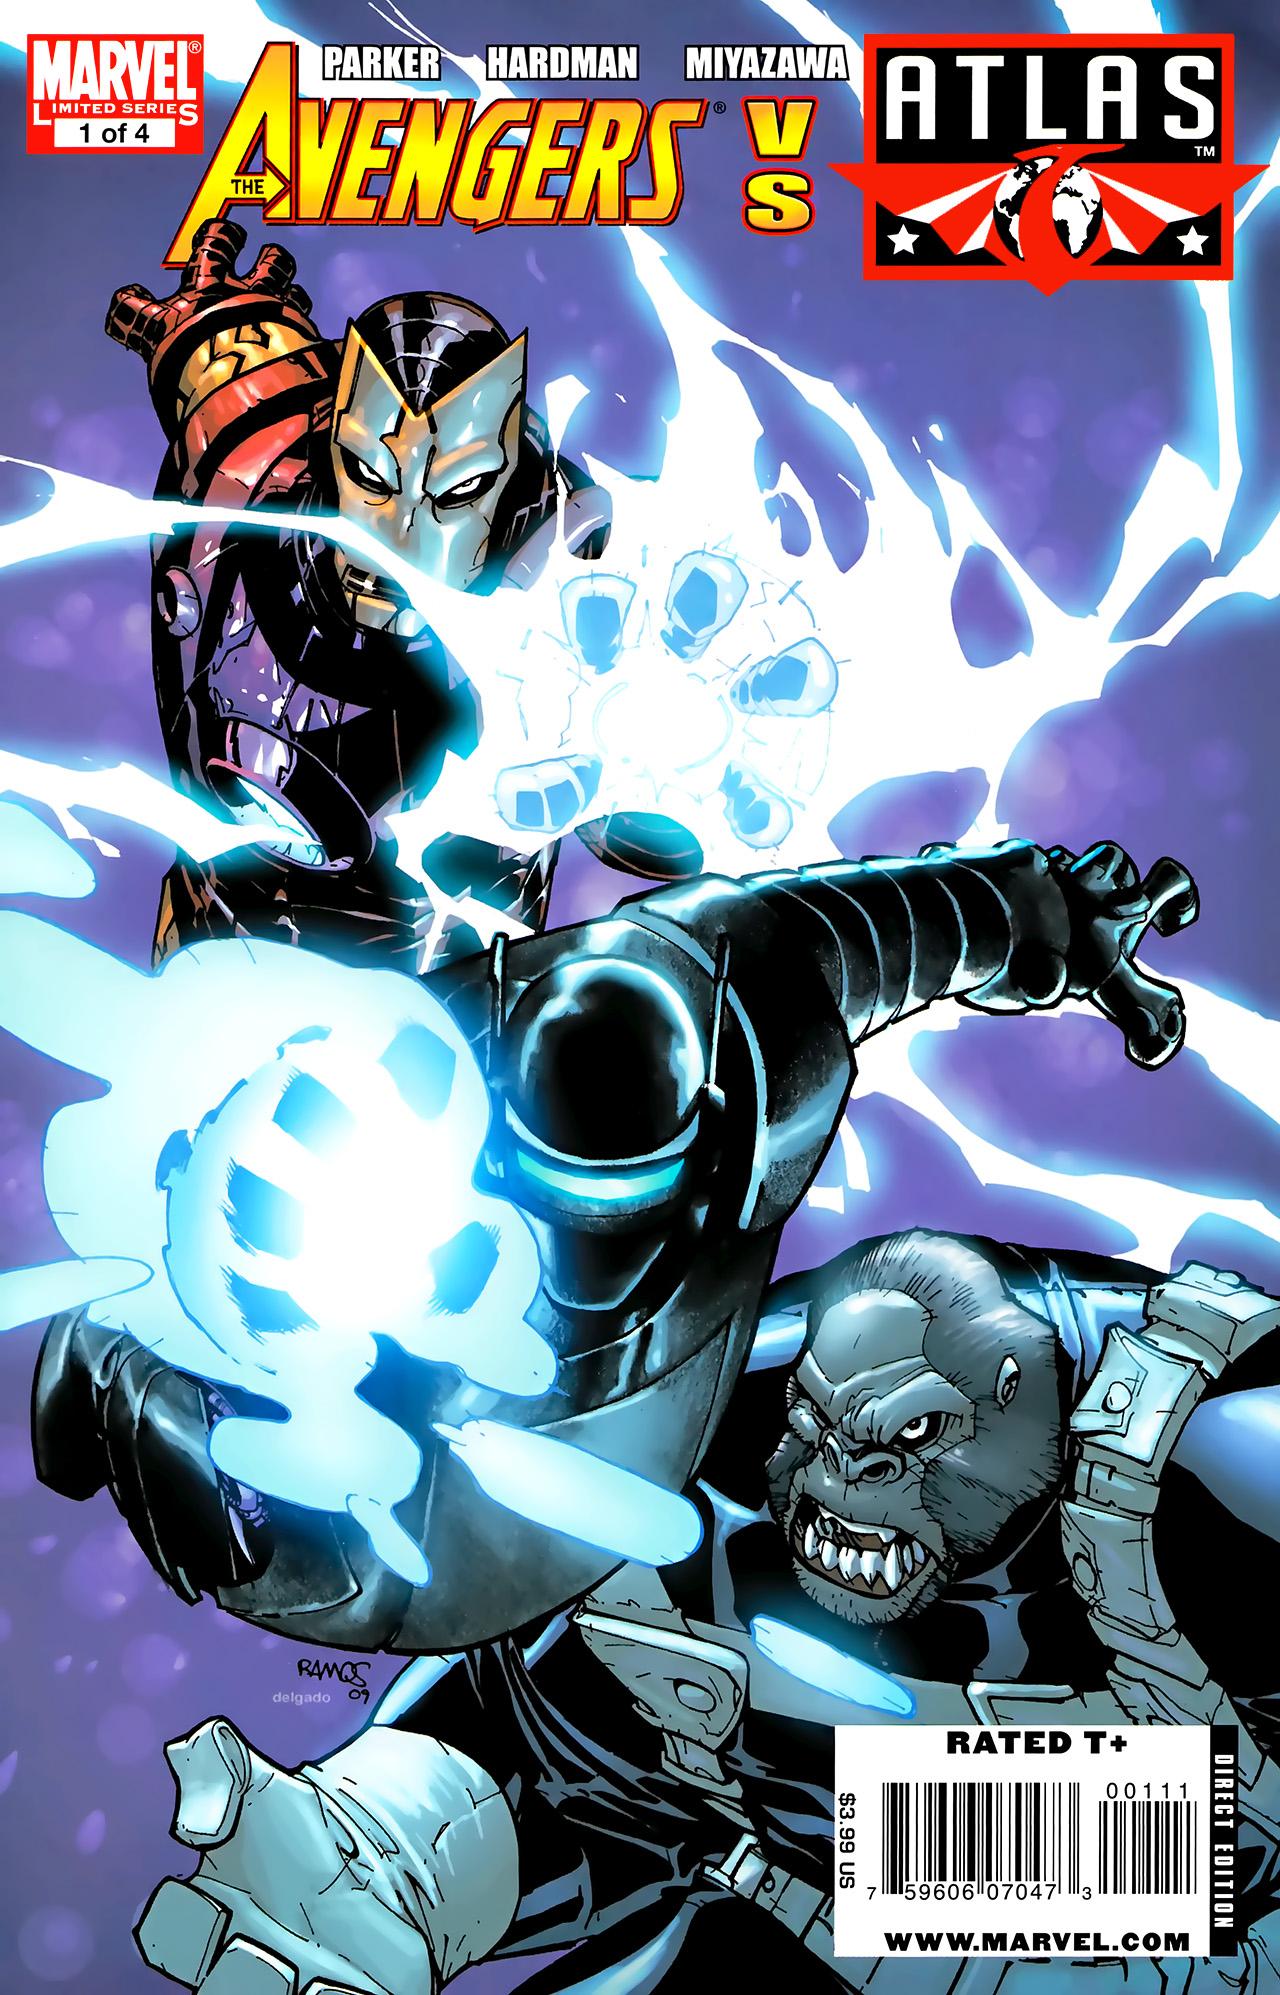 Avengers vs. Atlas 1 Page 1